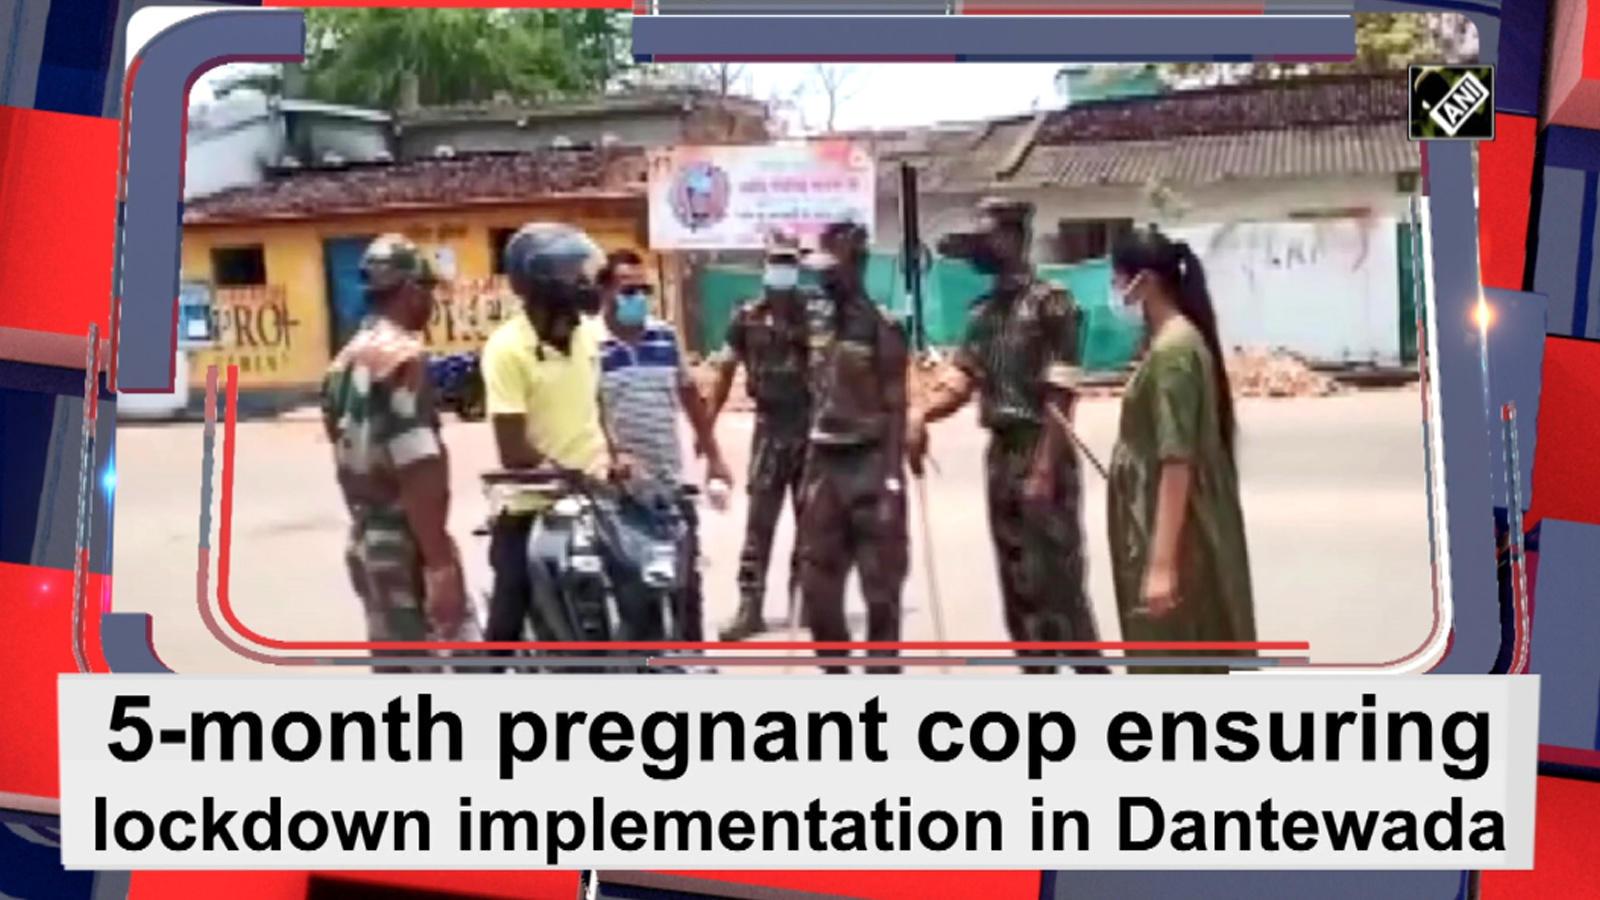 5-month-pregnant-cop-ensuring-lockdown-implementation-in-dantewada